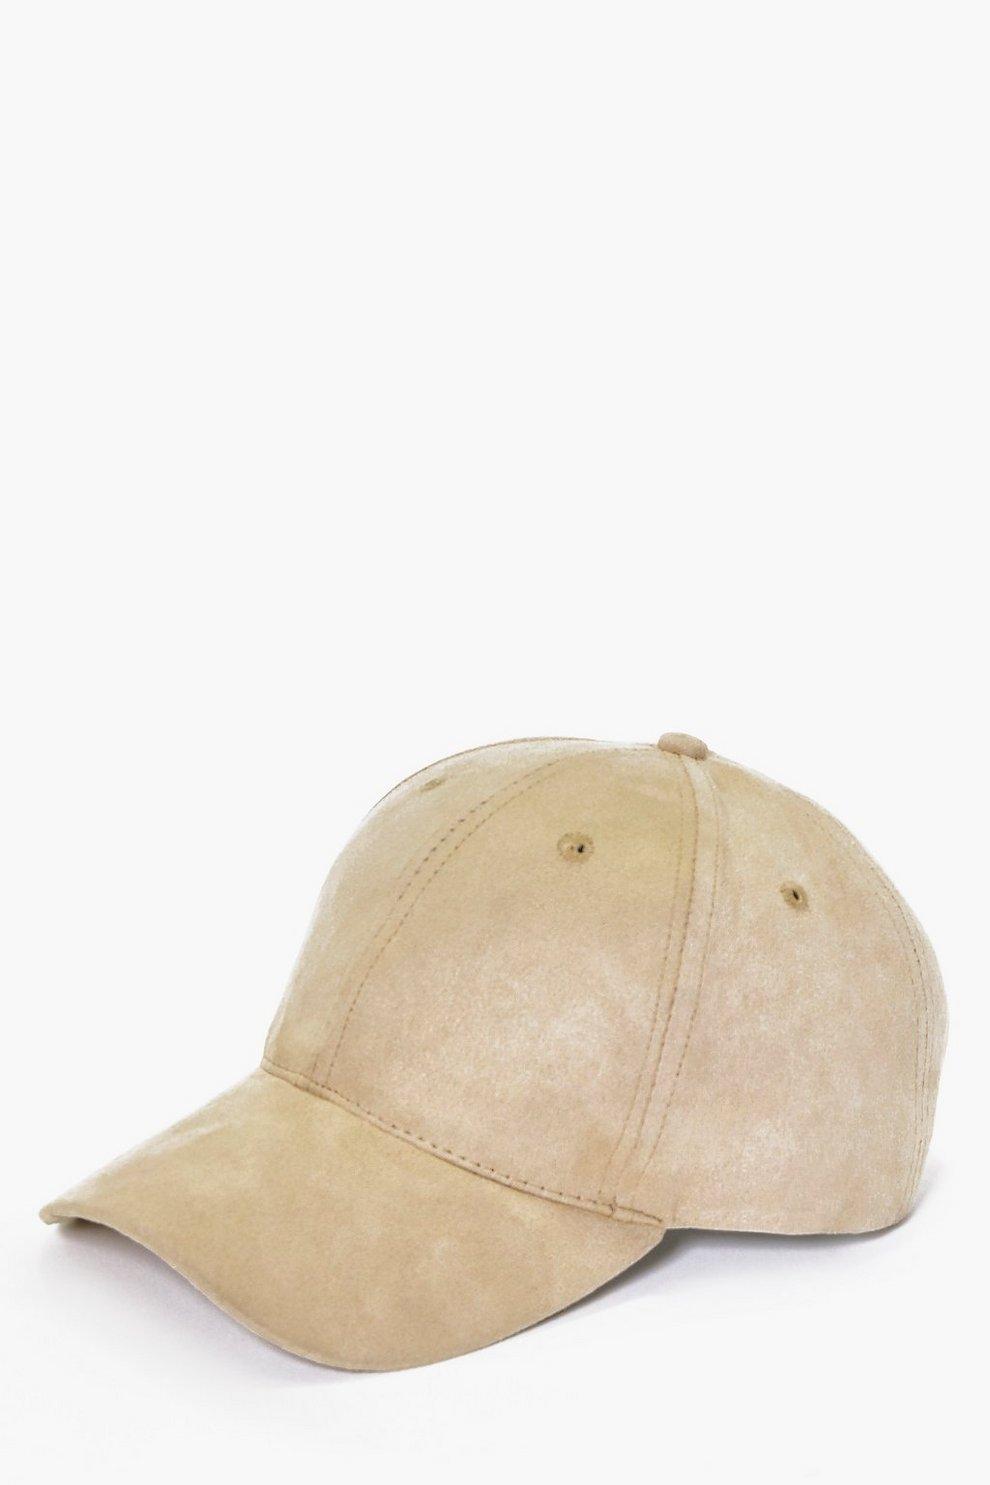 538603139e7 Sand Faux Suede Baseball Cap